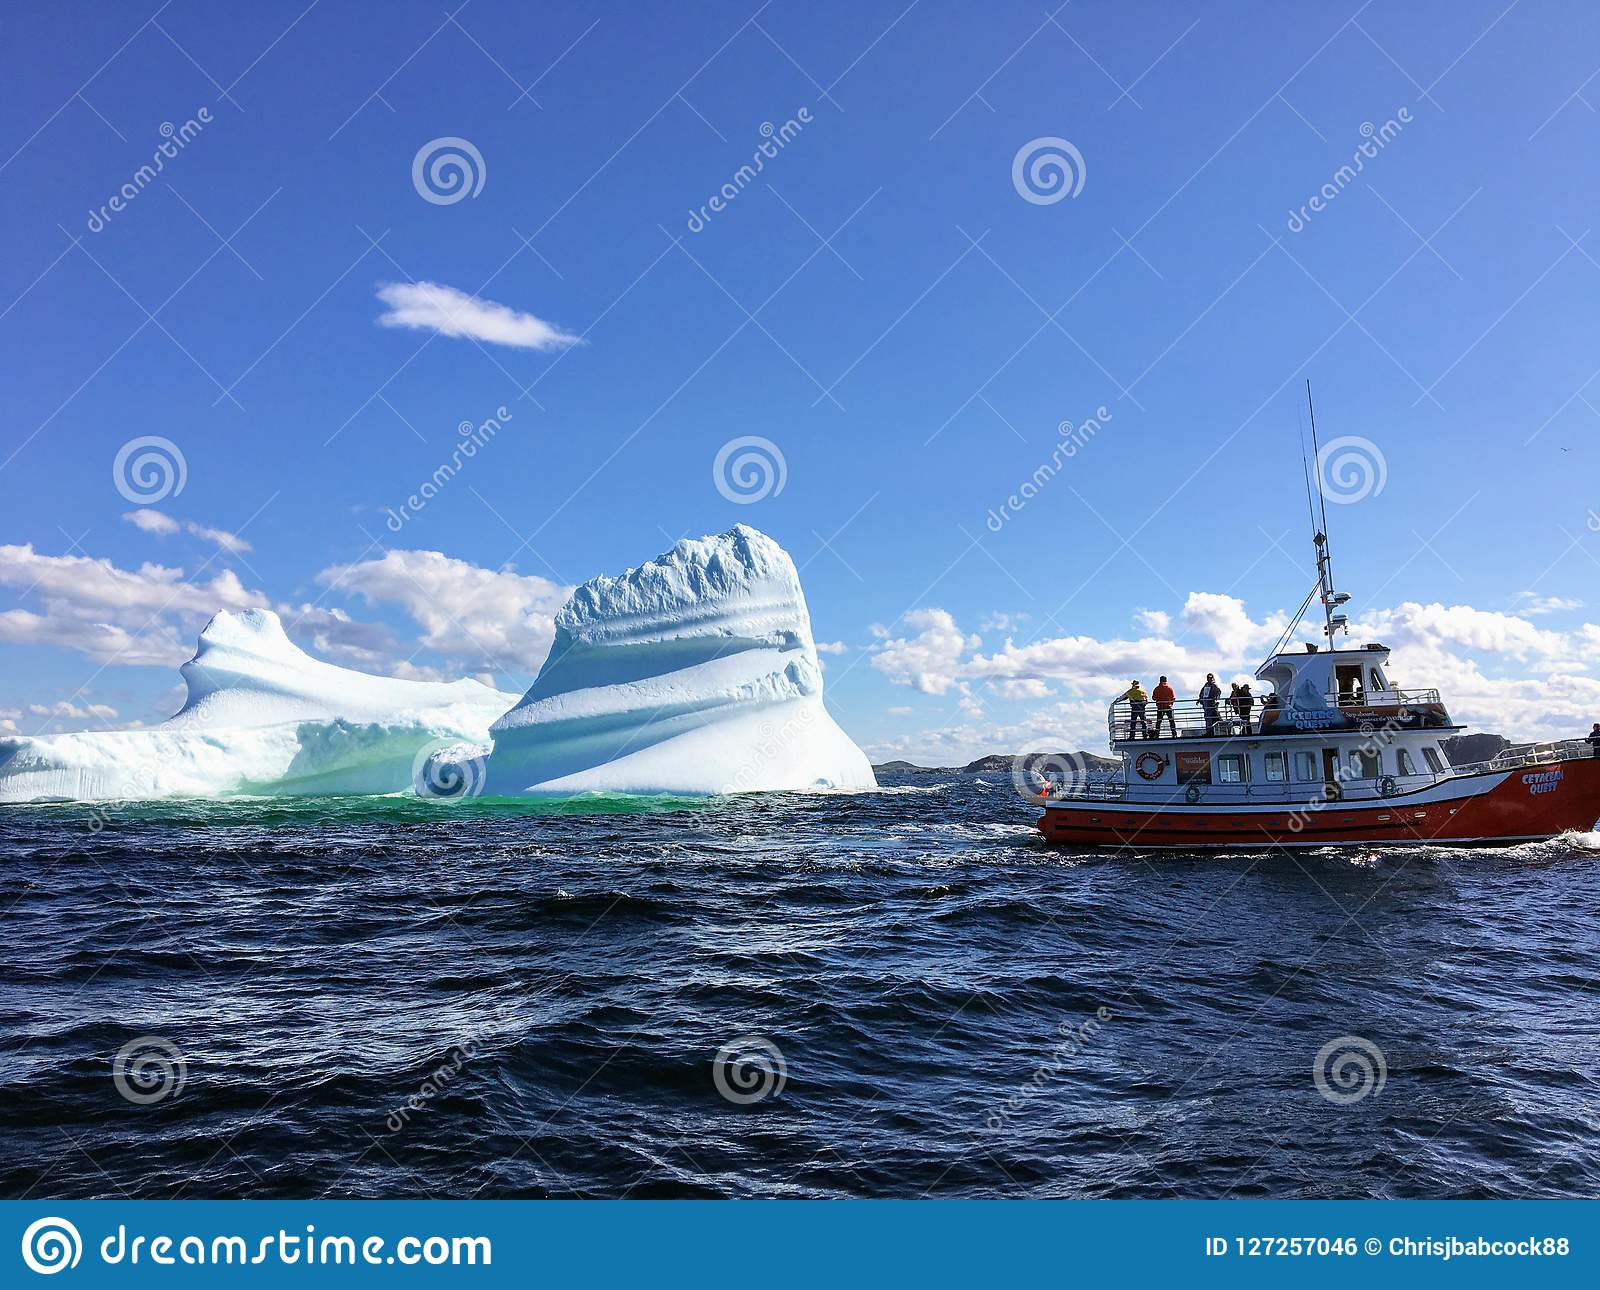 Twilingate, Newfoundland, Canada - July 23rd, 2017: A tour boat